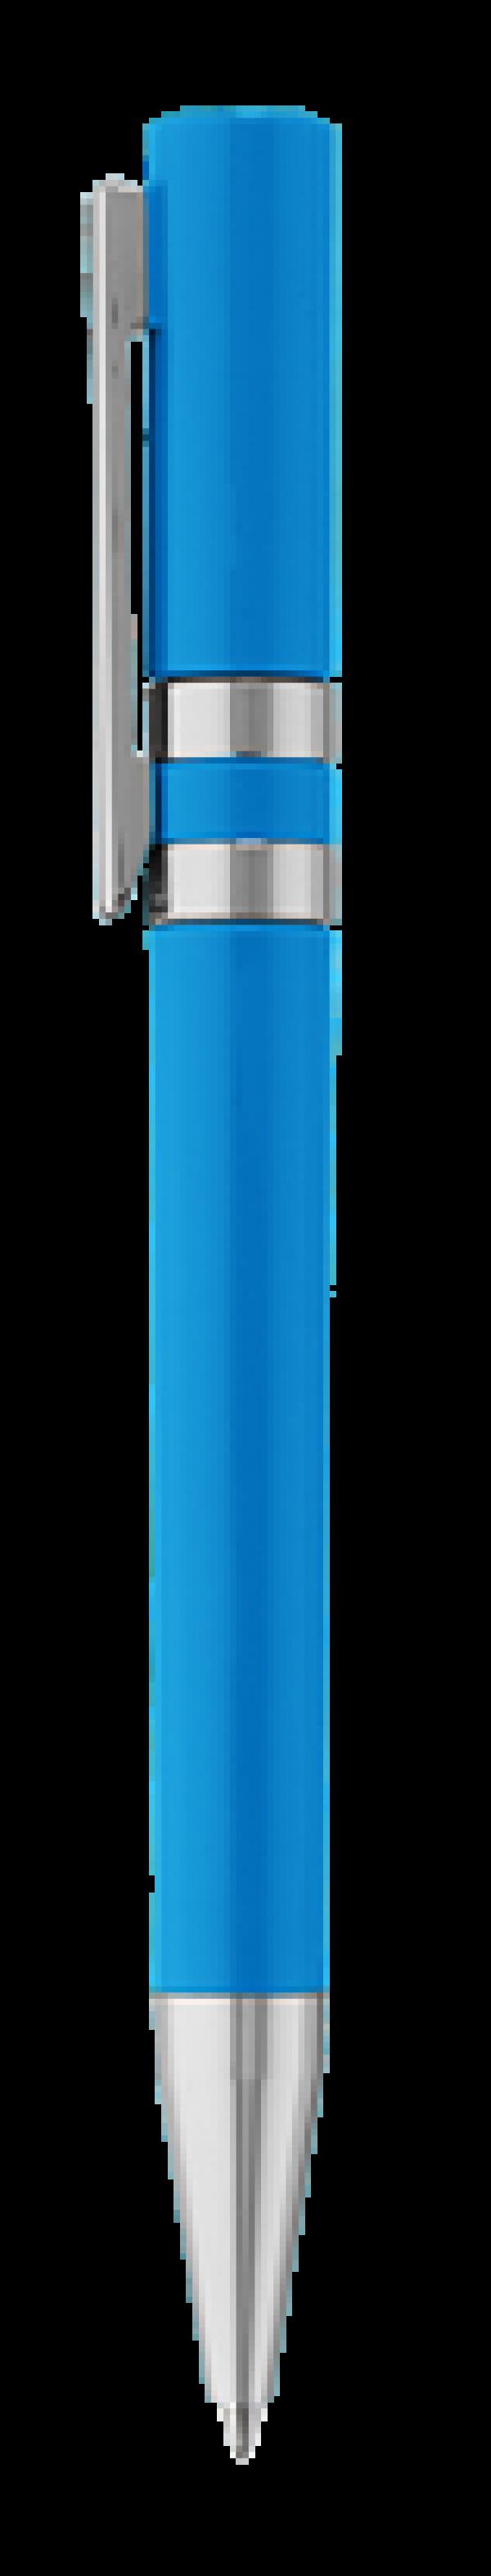 Шариковая ручка b 0-0045 SI RINGO